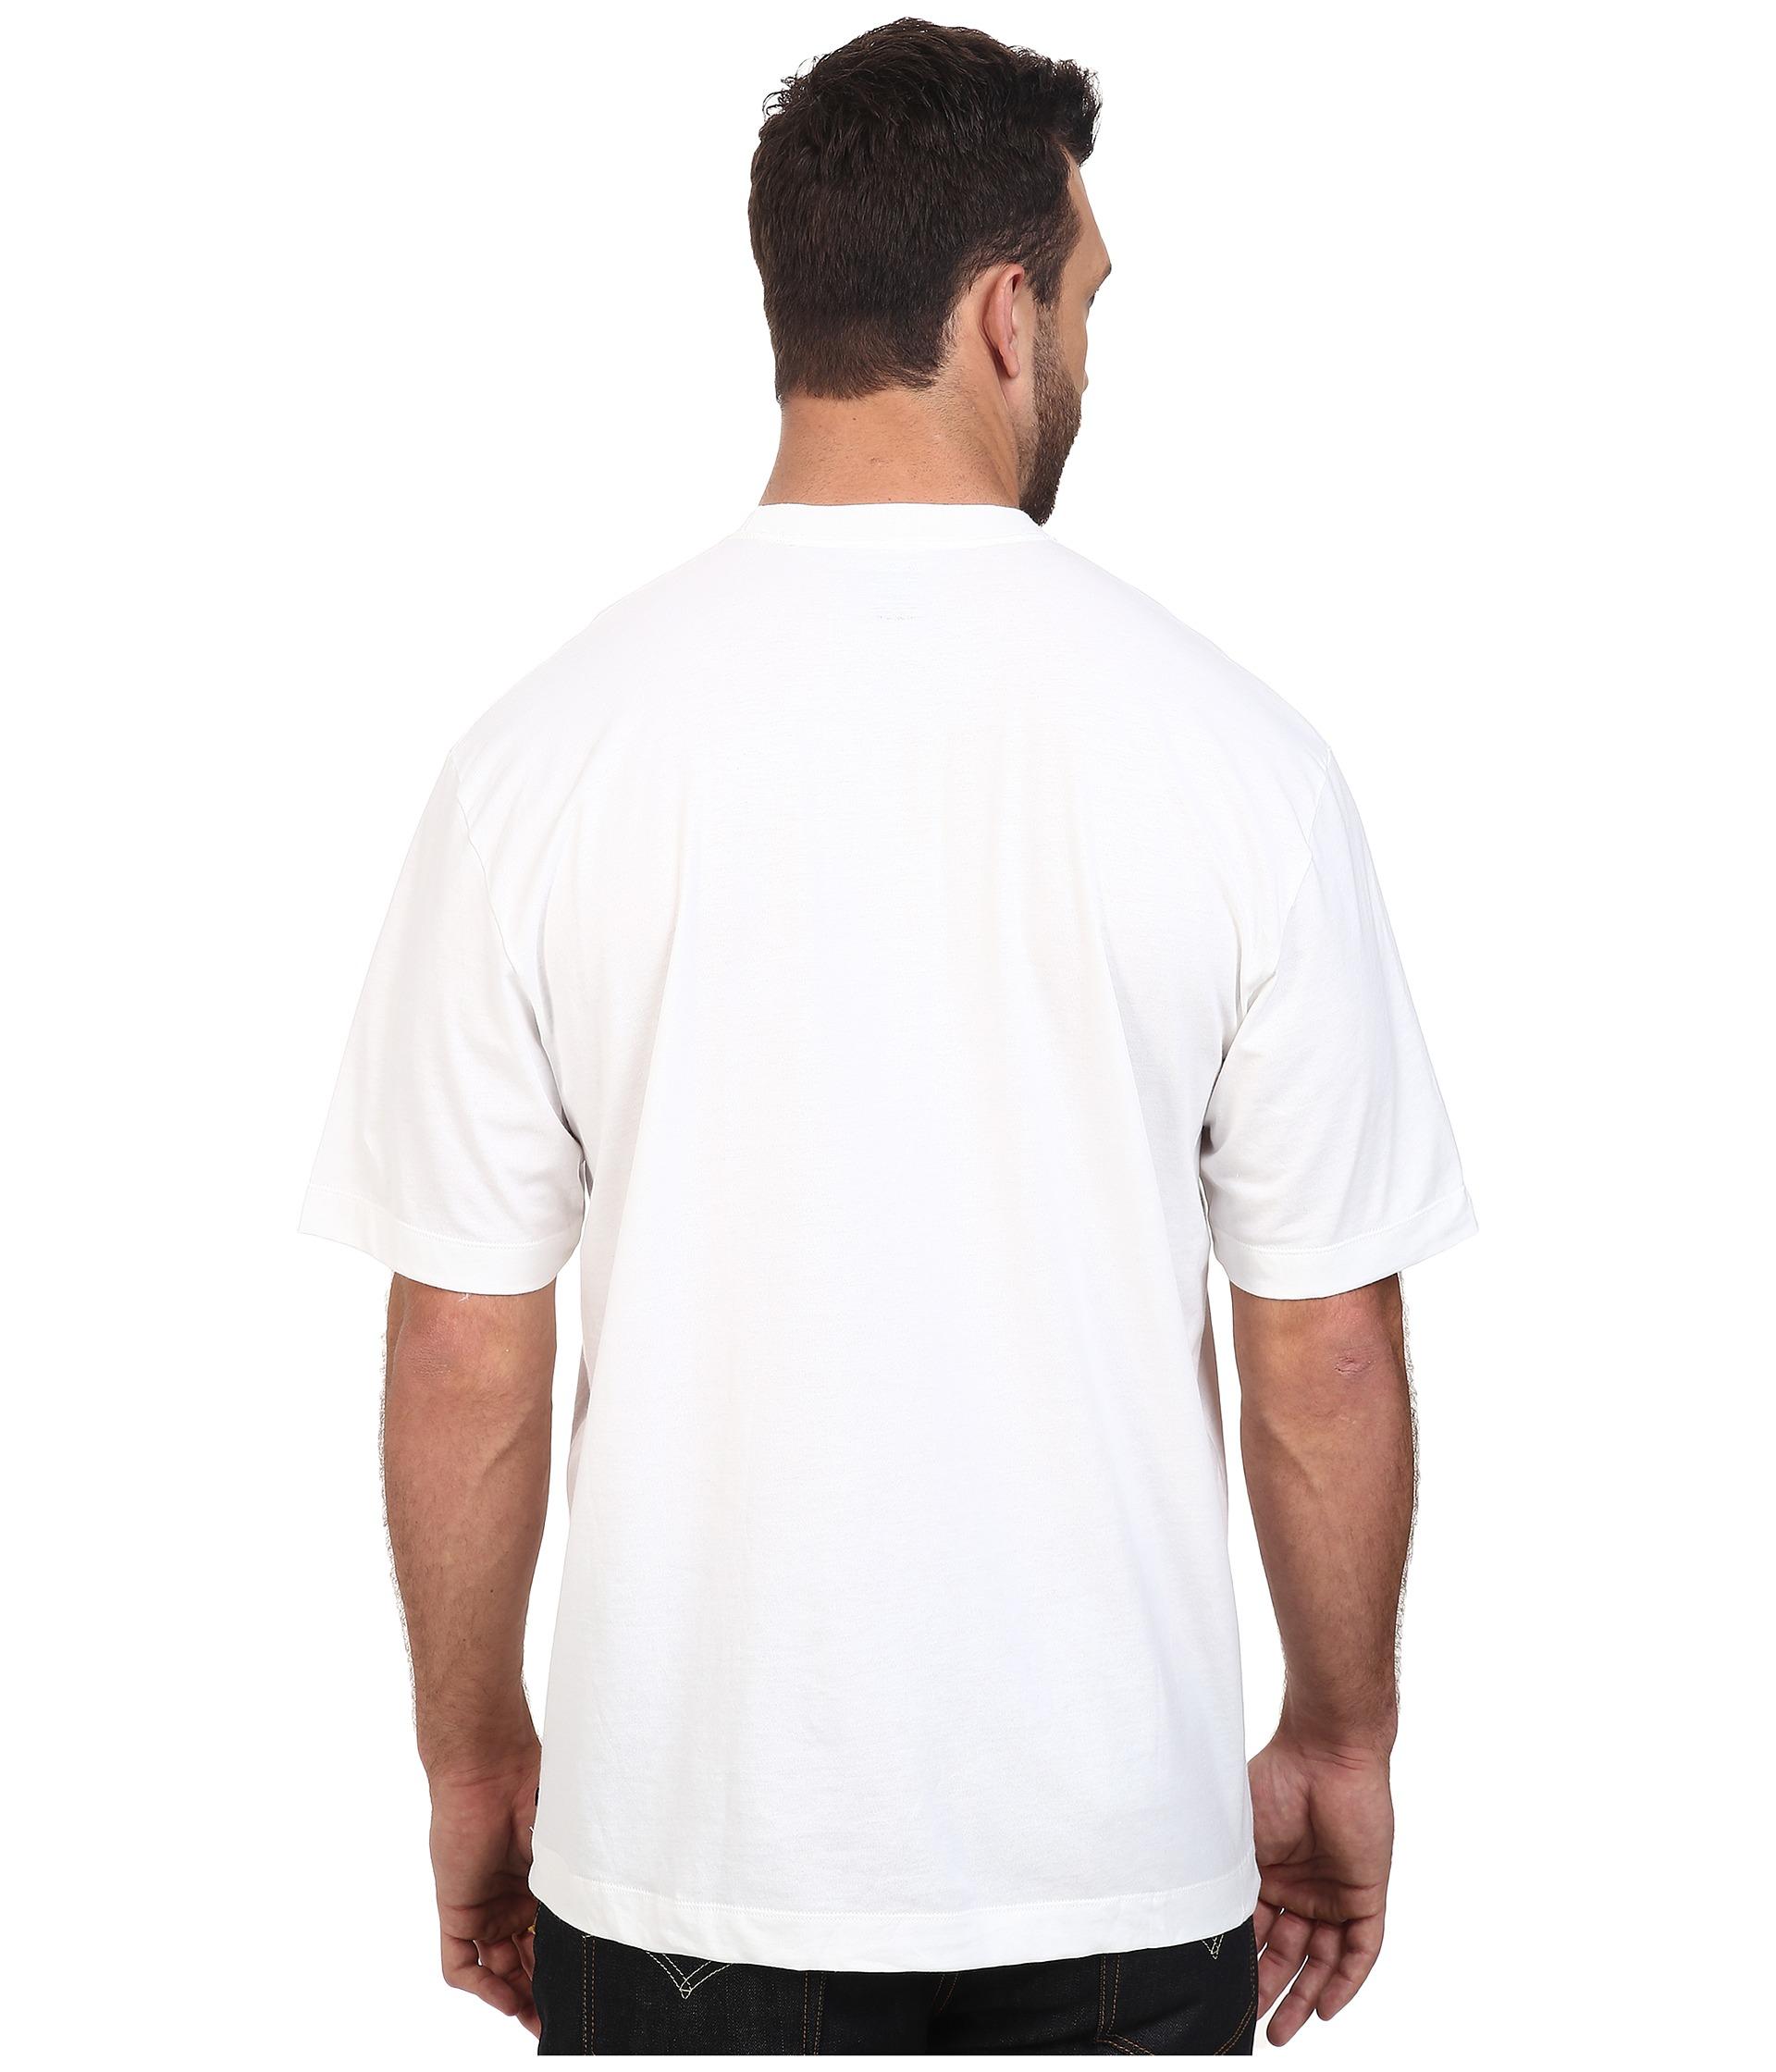 Jockey big man staycool cotton modern fit crew t shirt for Jockey t shirts sale